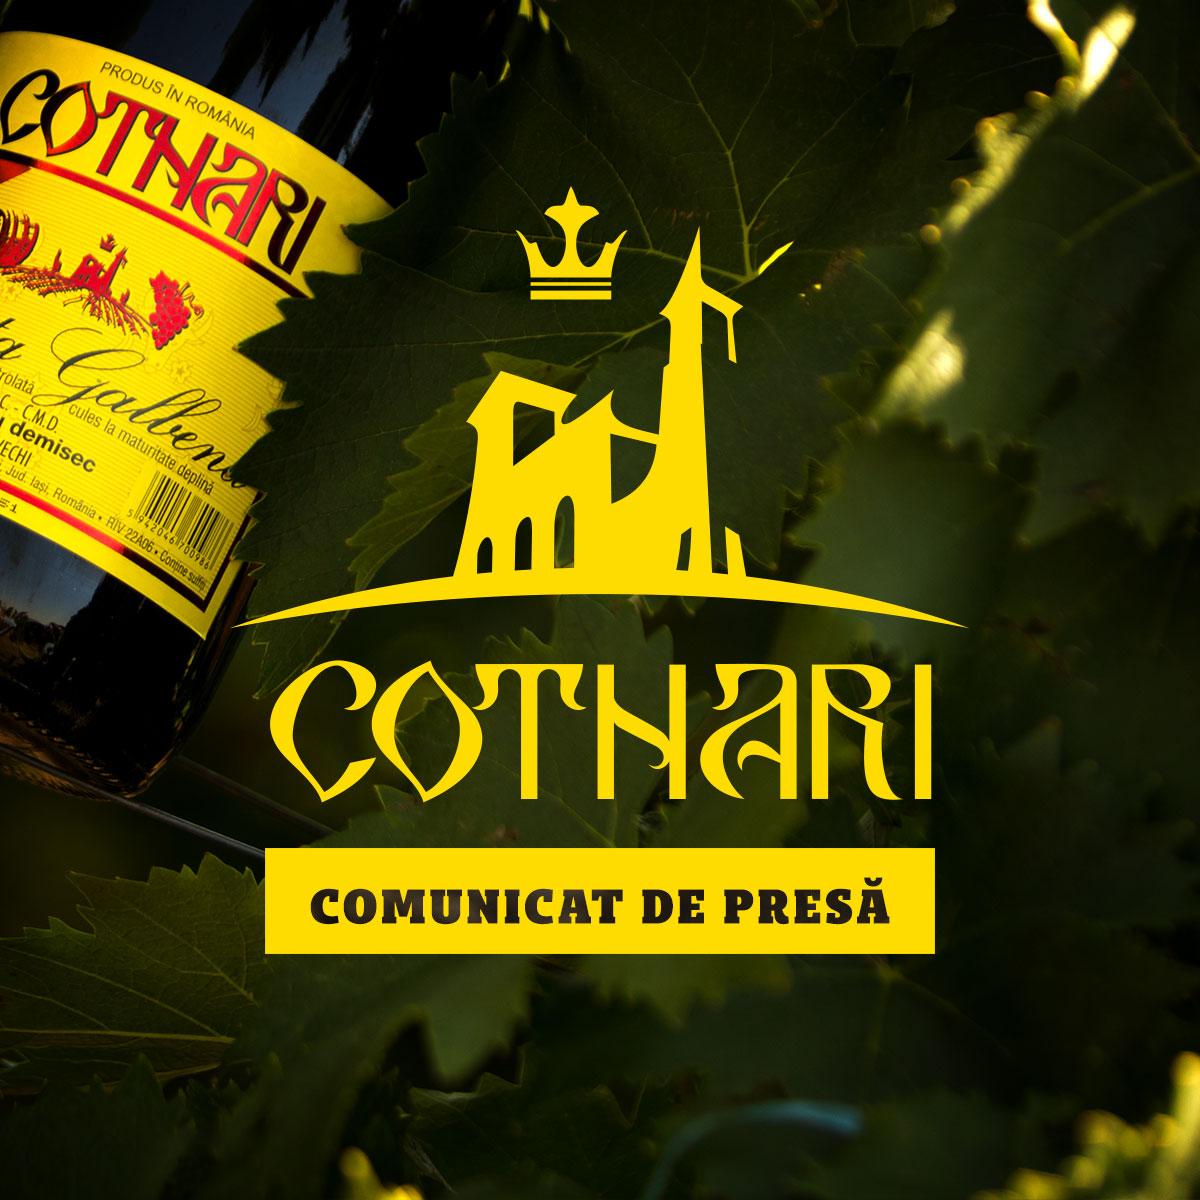 https://www.cotnari.ro/continut/uploads/2017/08/comunicat14.jpg